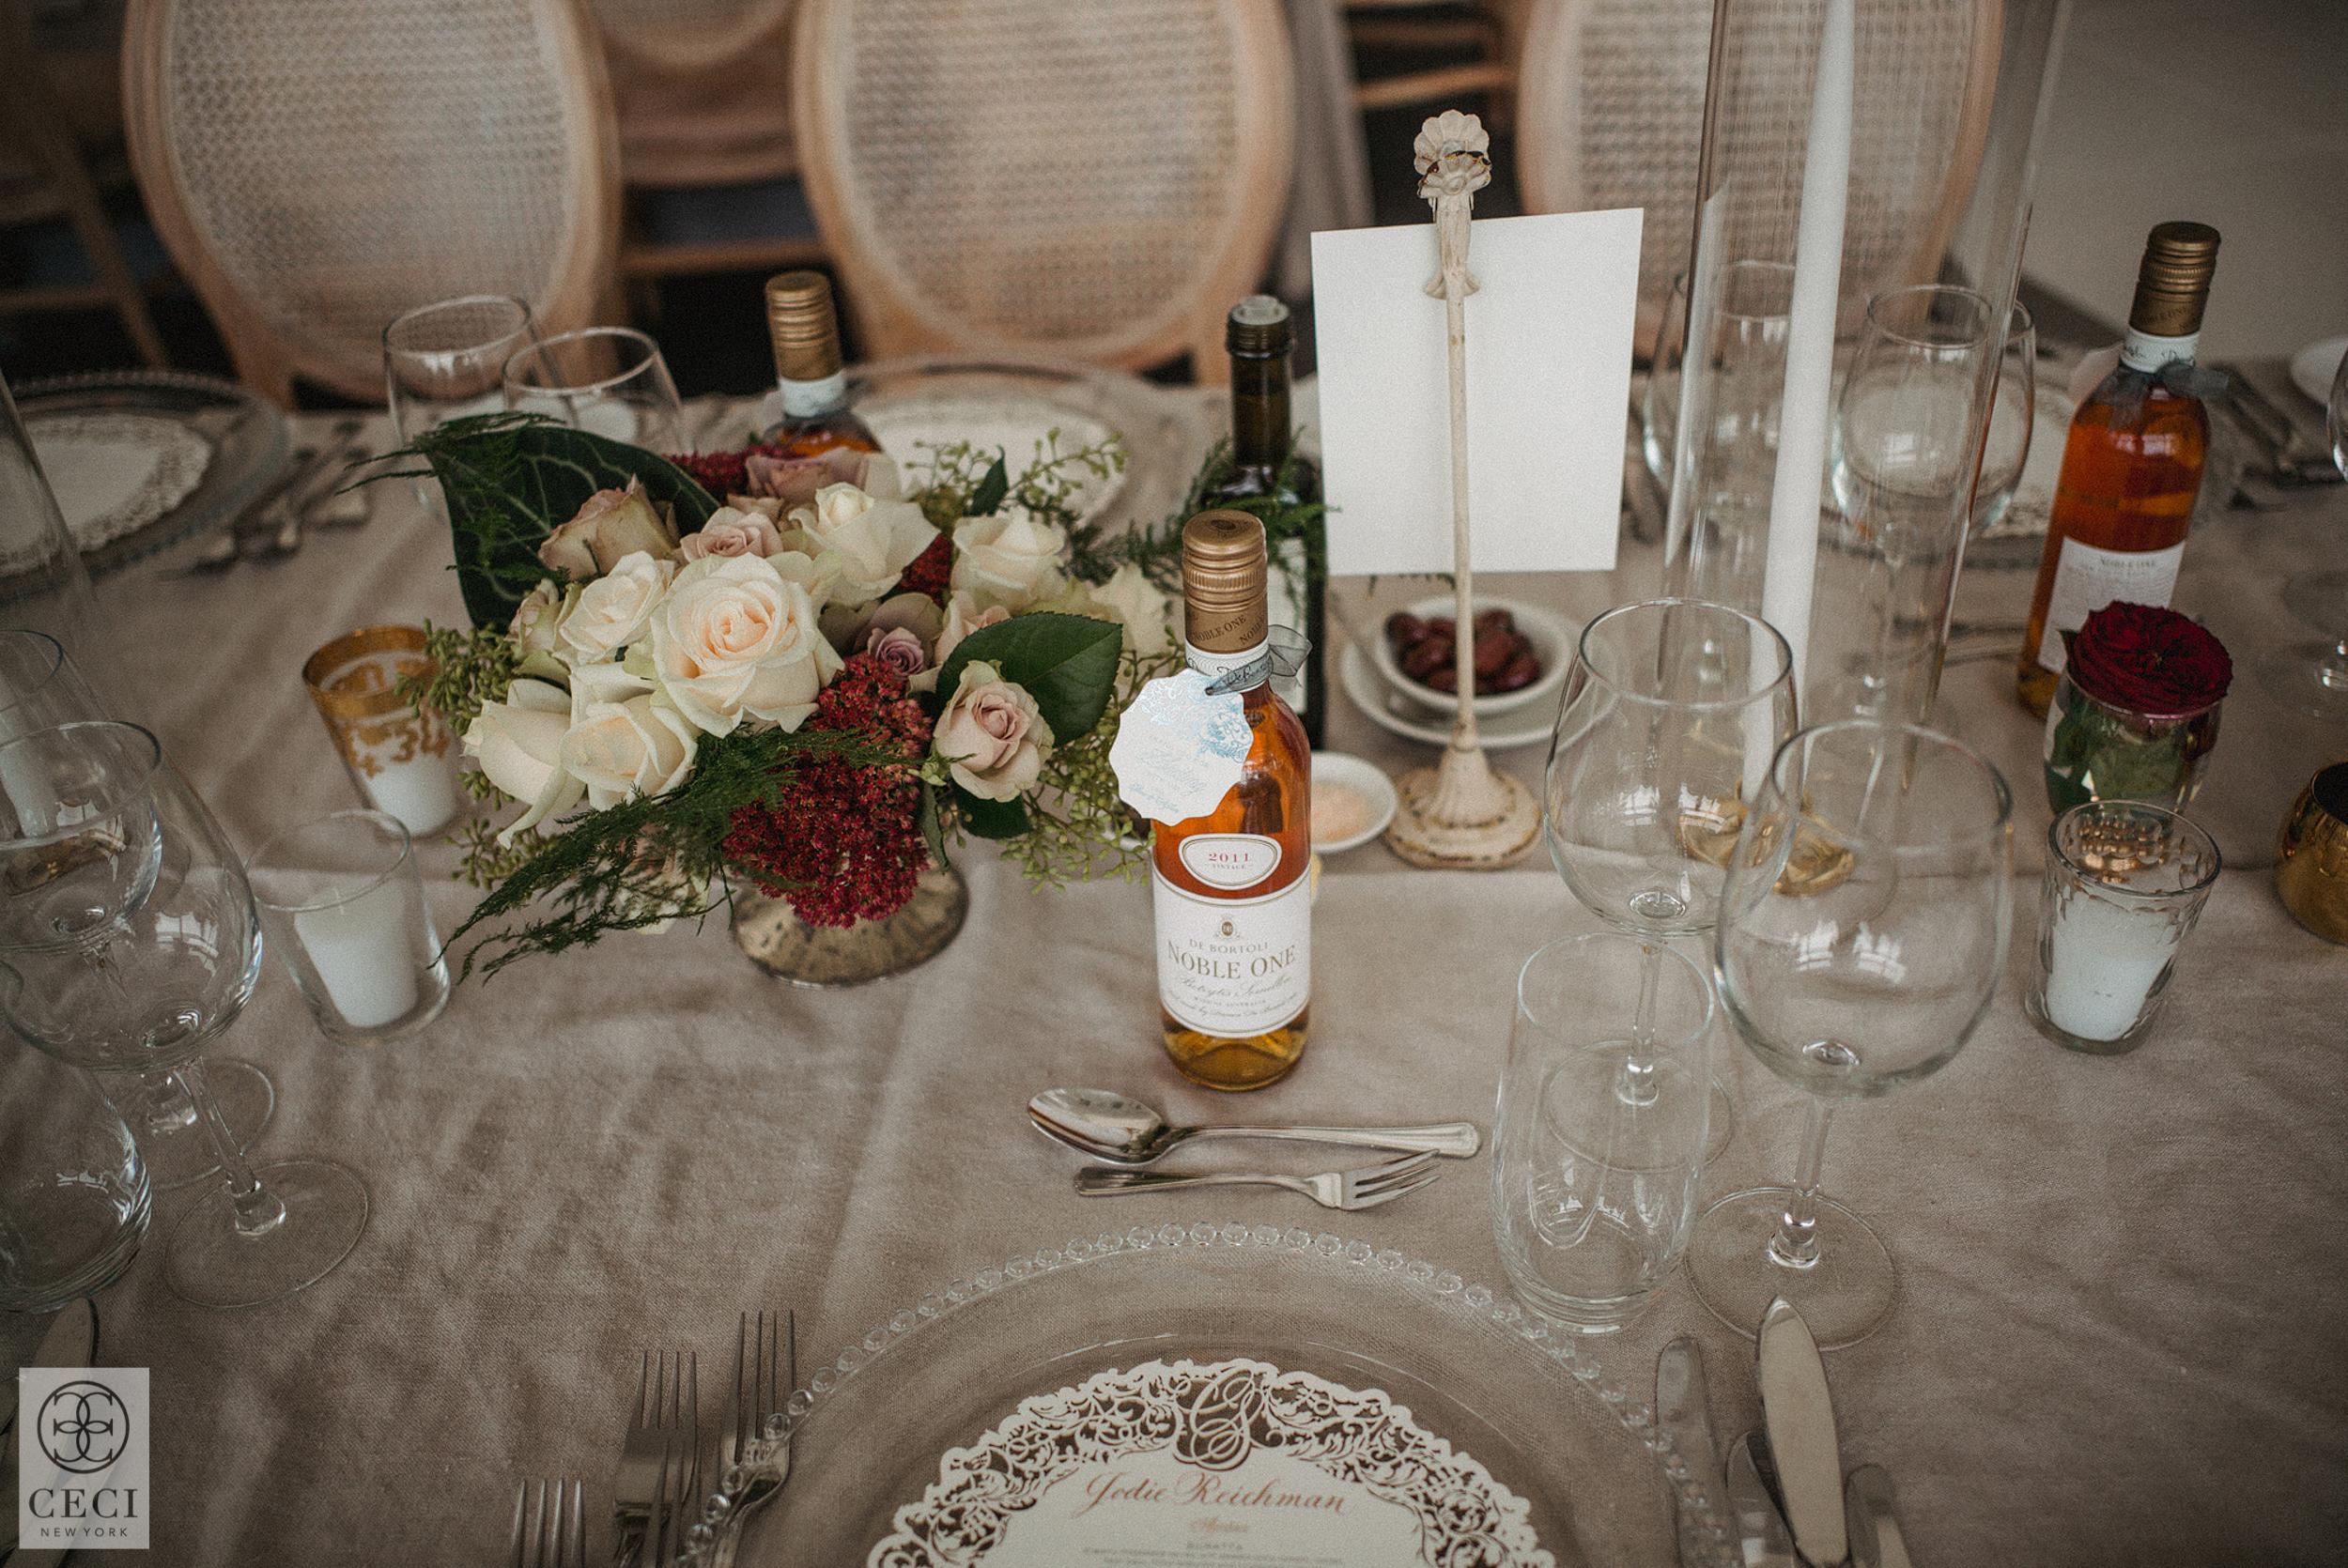 Ceci_New_York_Custom_Luxury_Wedding_BeautyShot_LaserCut_Stationery_Personalized_Couture_Foil_Stamping_Perth_Destination_Australia_Chic_-15.jpg